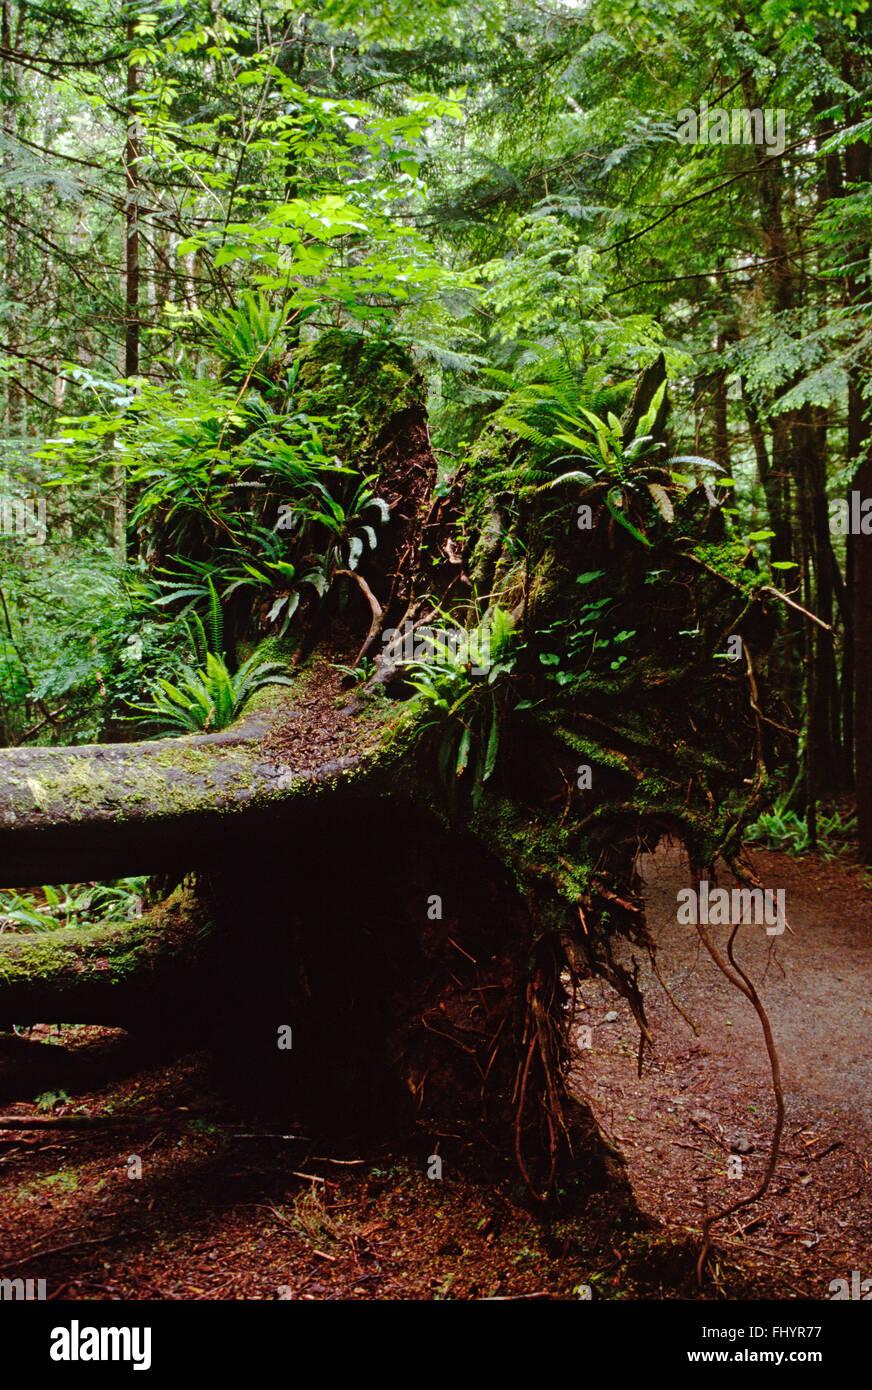 Fallen trees provide nourishment for plant communities on TEMPORATE RAIN FOREST FLOOR - OLYMPIC NATIONAL PARK, WASHINGTON - Stock Image